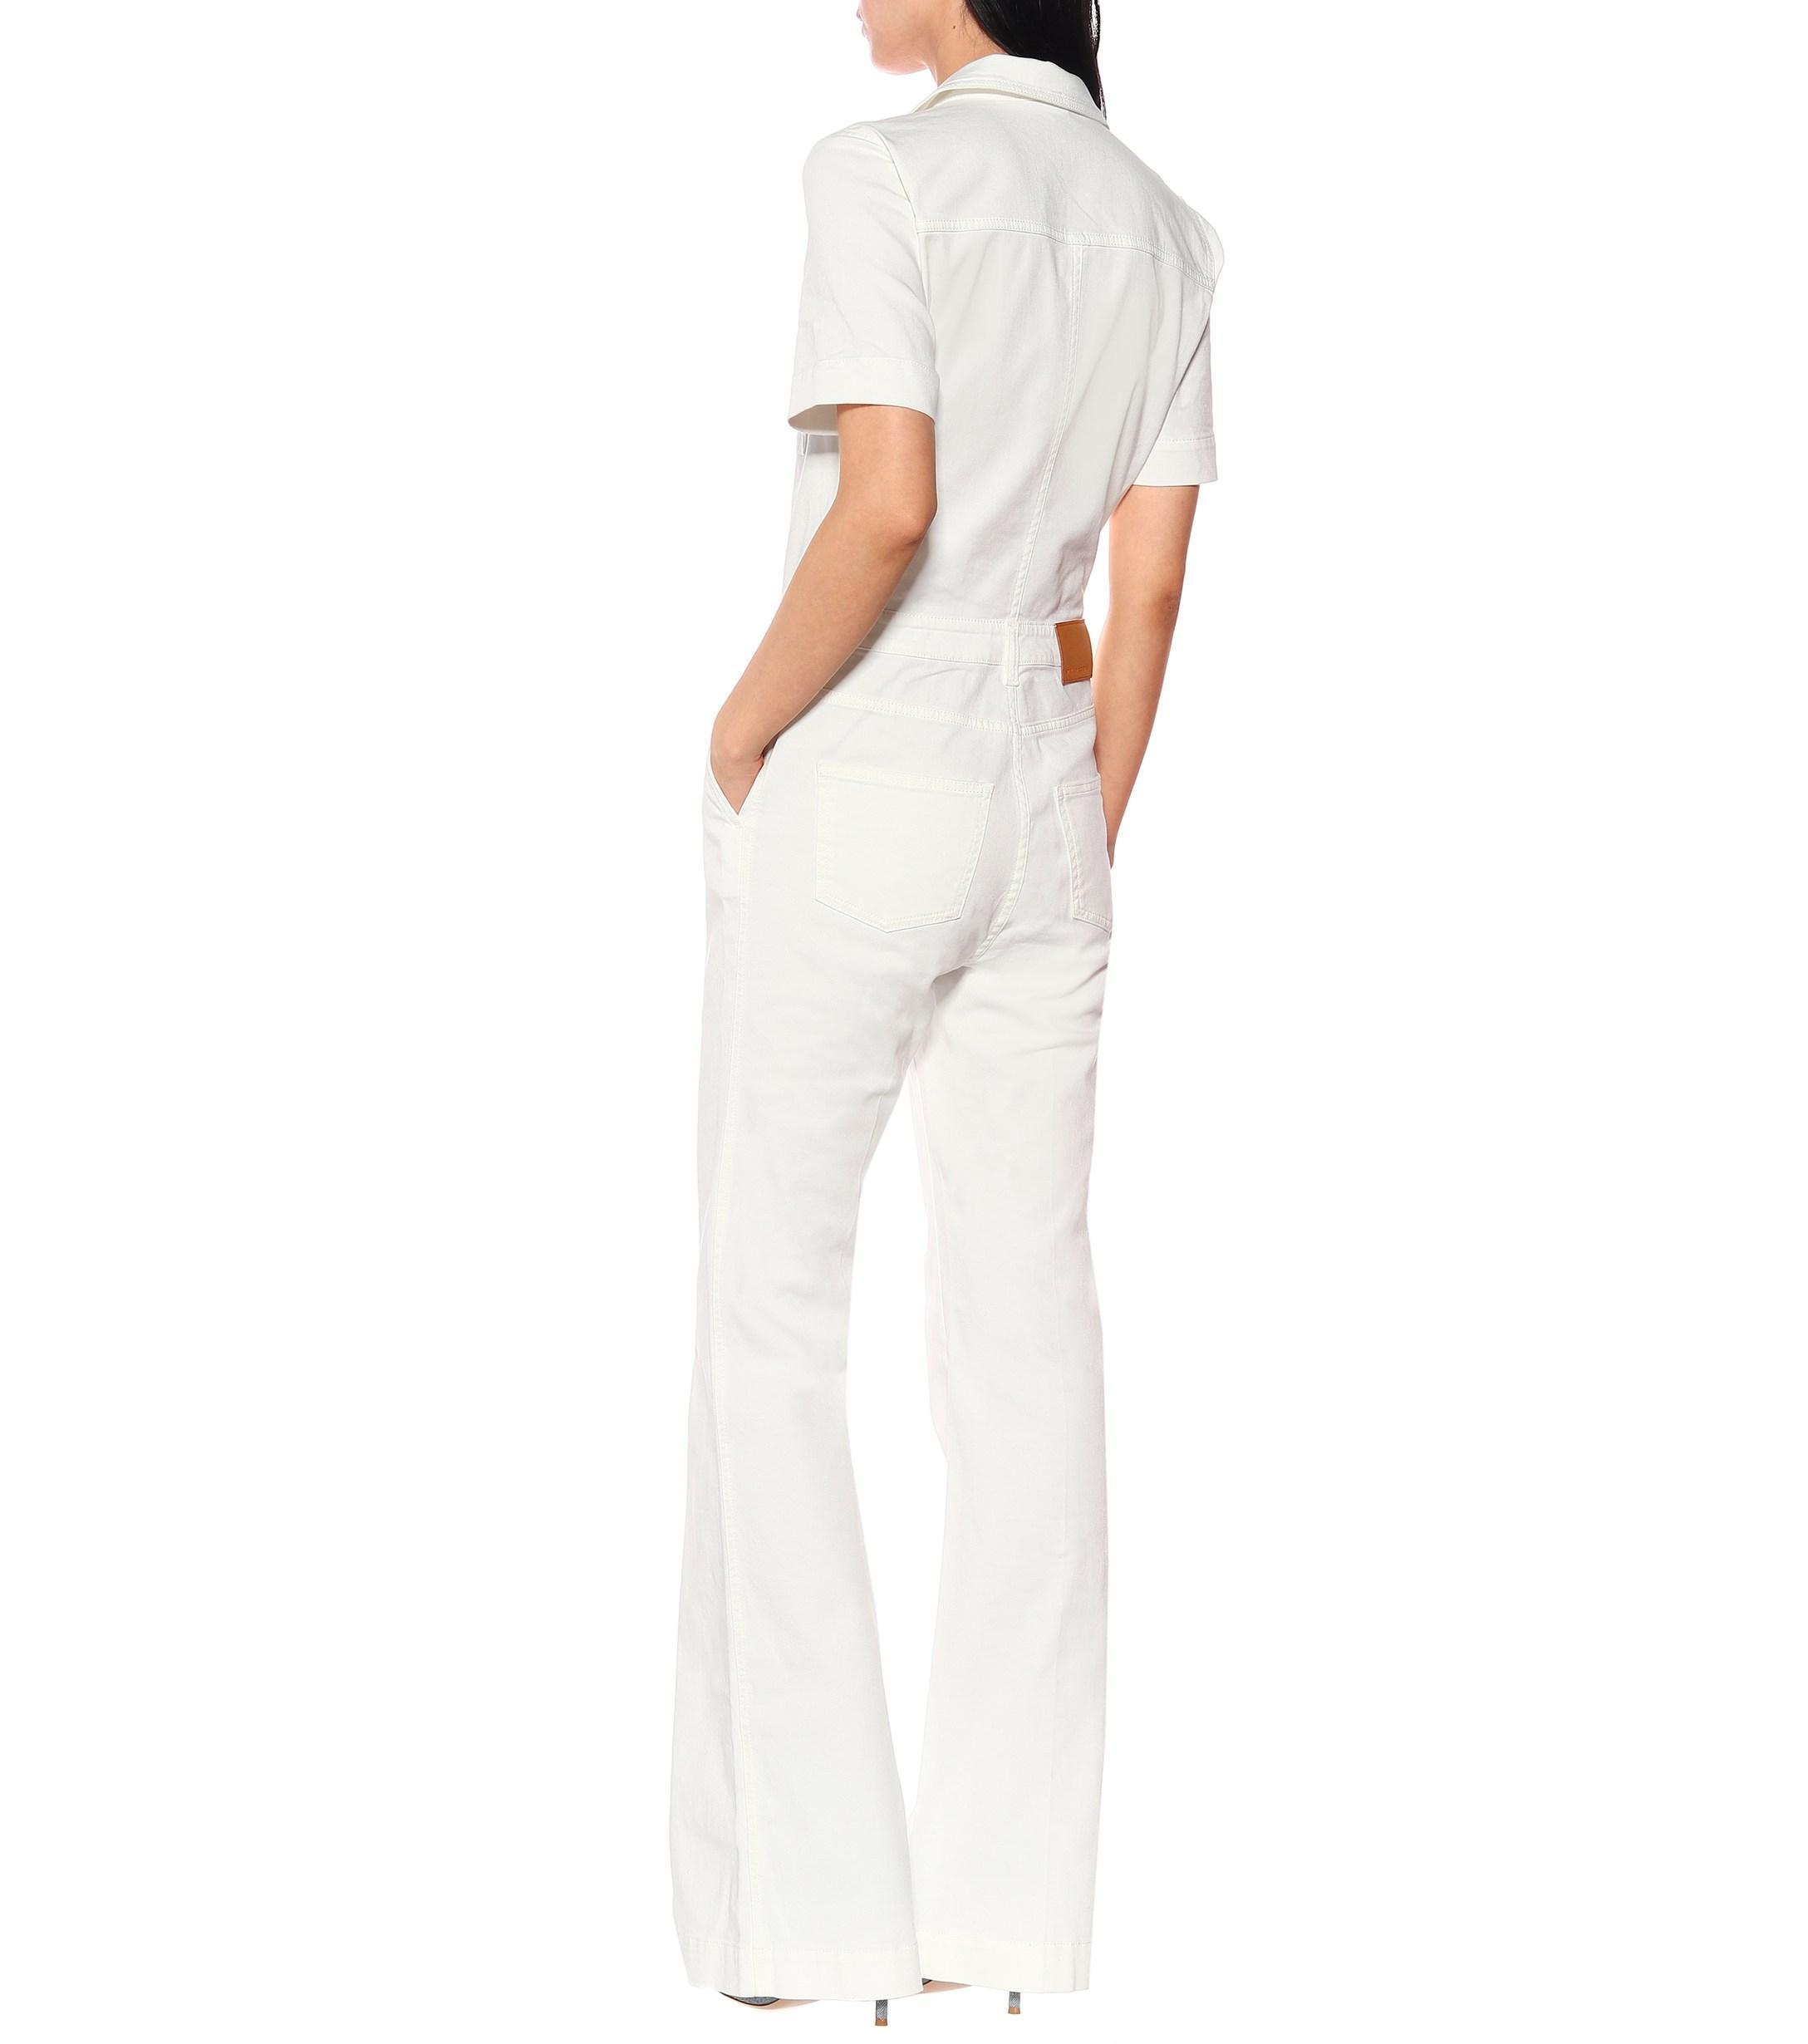 fad0f2bfd8f7 Stella McCartney Stretch Denim Jumpsuit in White - Lyst